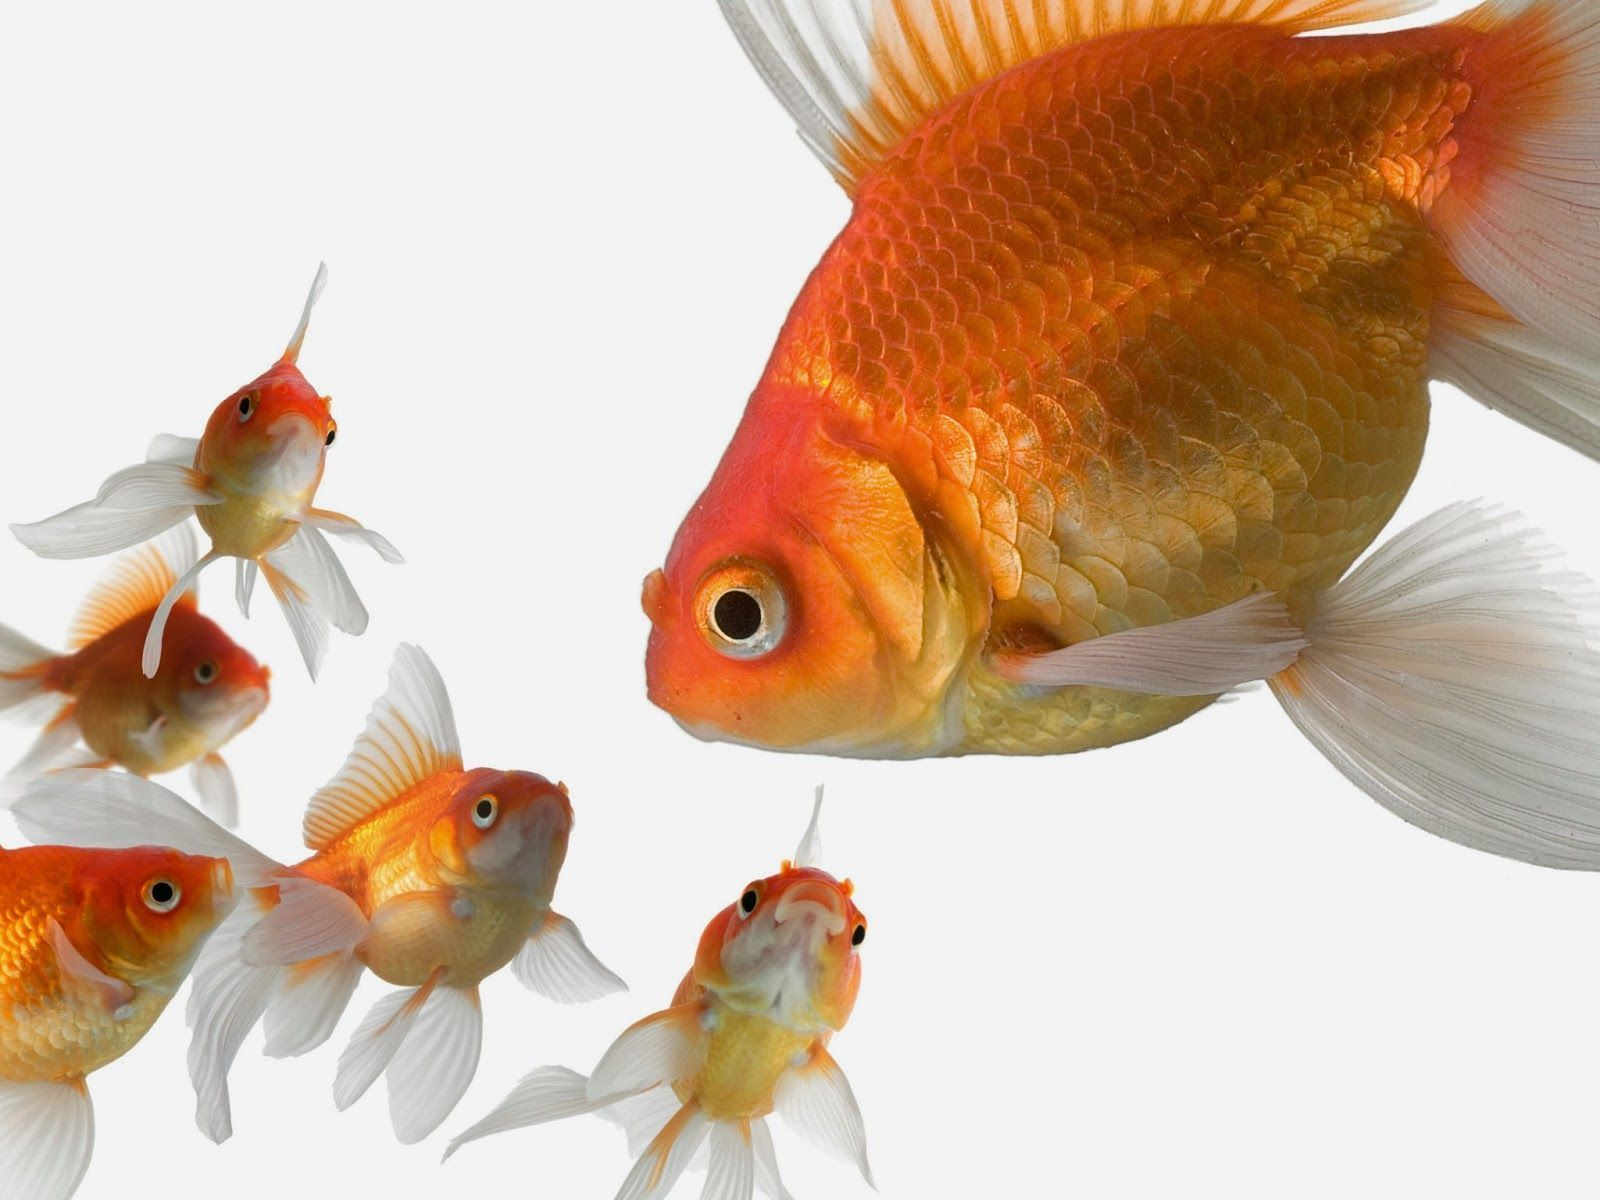 Gold Fish Wallpapers Wallpaper Cave Goldfish Goldfish Wallpaper Fish Wallpaper